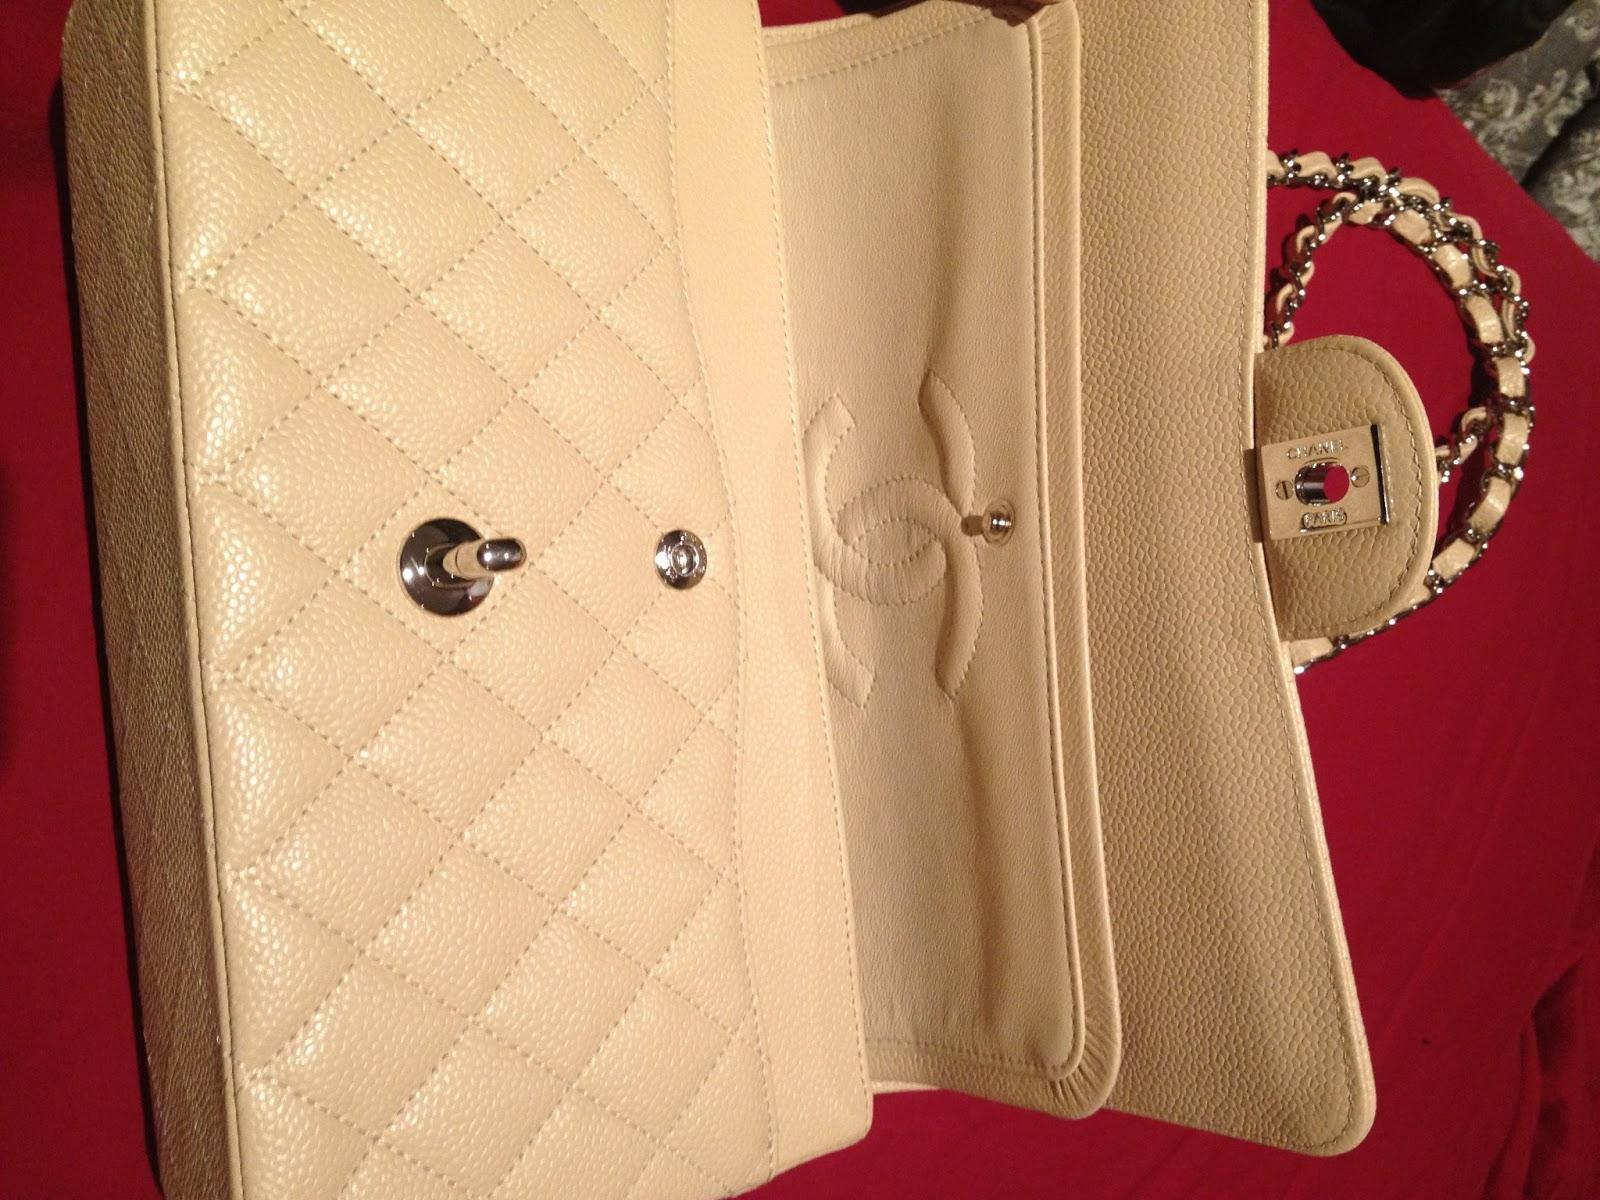 5c0ddb3f953e Close up of the actual bag: 100% BRAND NEW CHANEL CLASSIC FLAP BAG MEDIUM  BEIGE CAVIAR